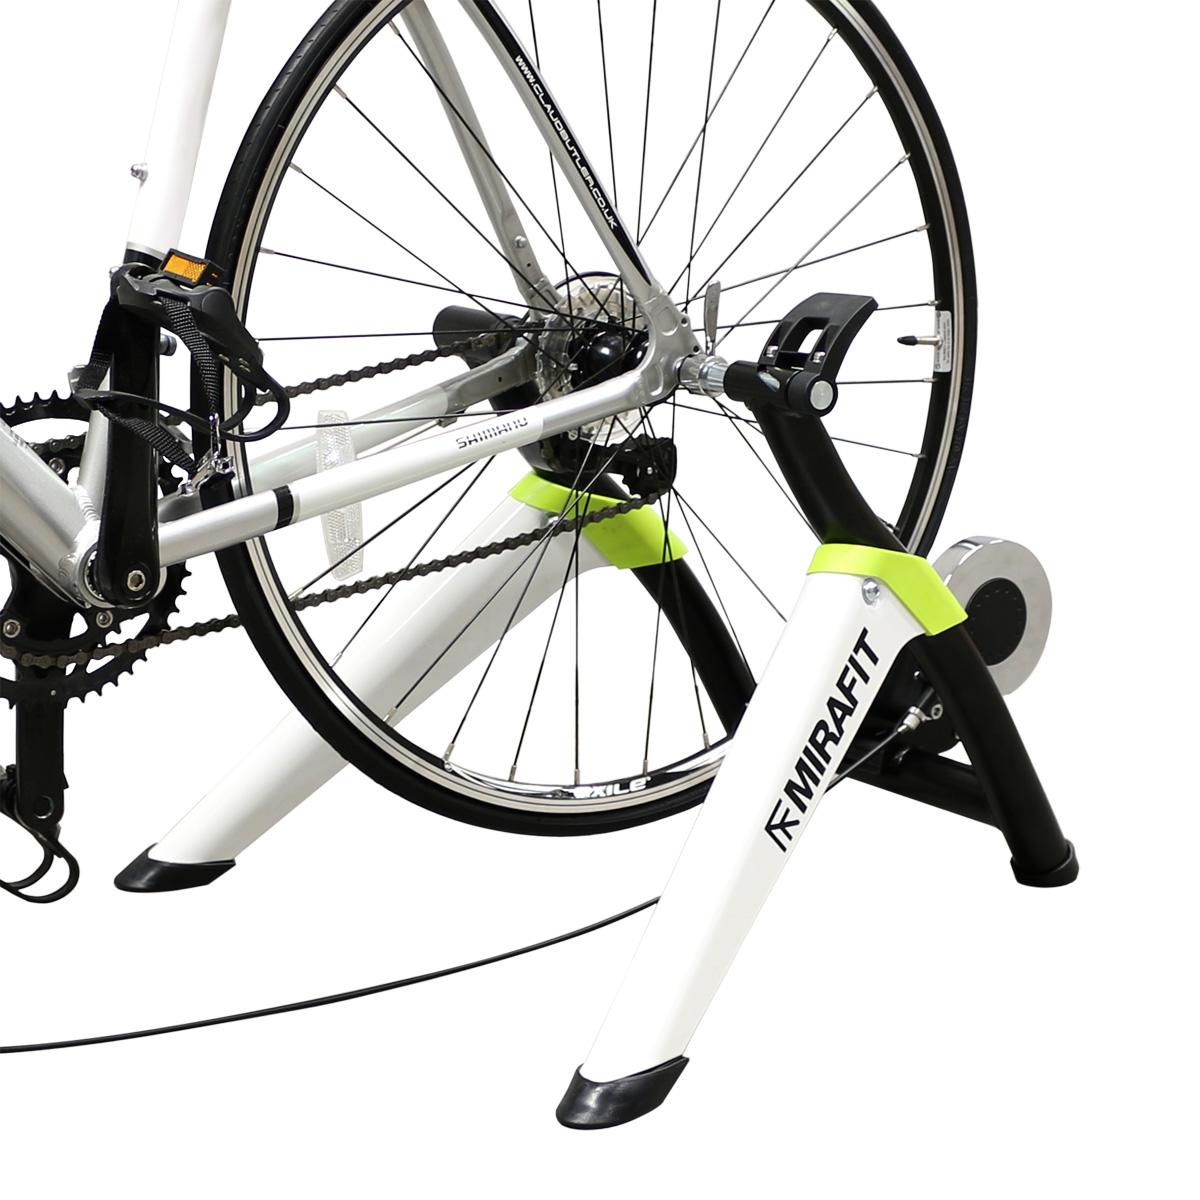 Turbo Bike Pic: MIRAFIT 8 Speed Adjustable Bicycle Turbo Trainer Triathlon